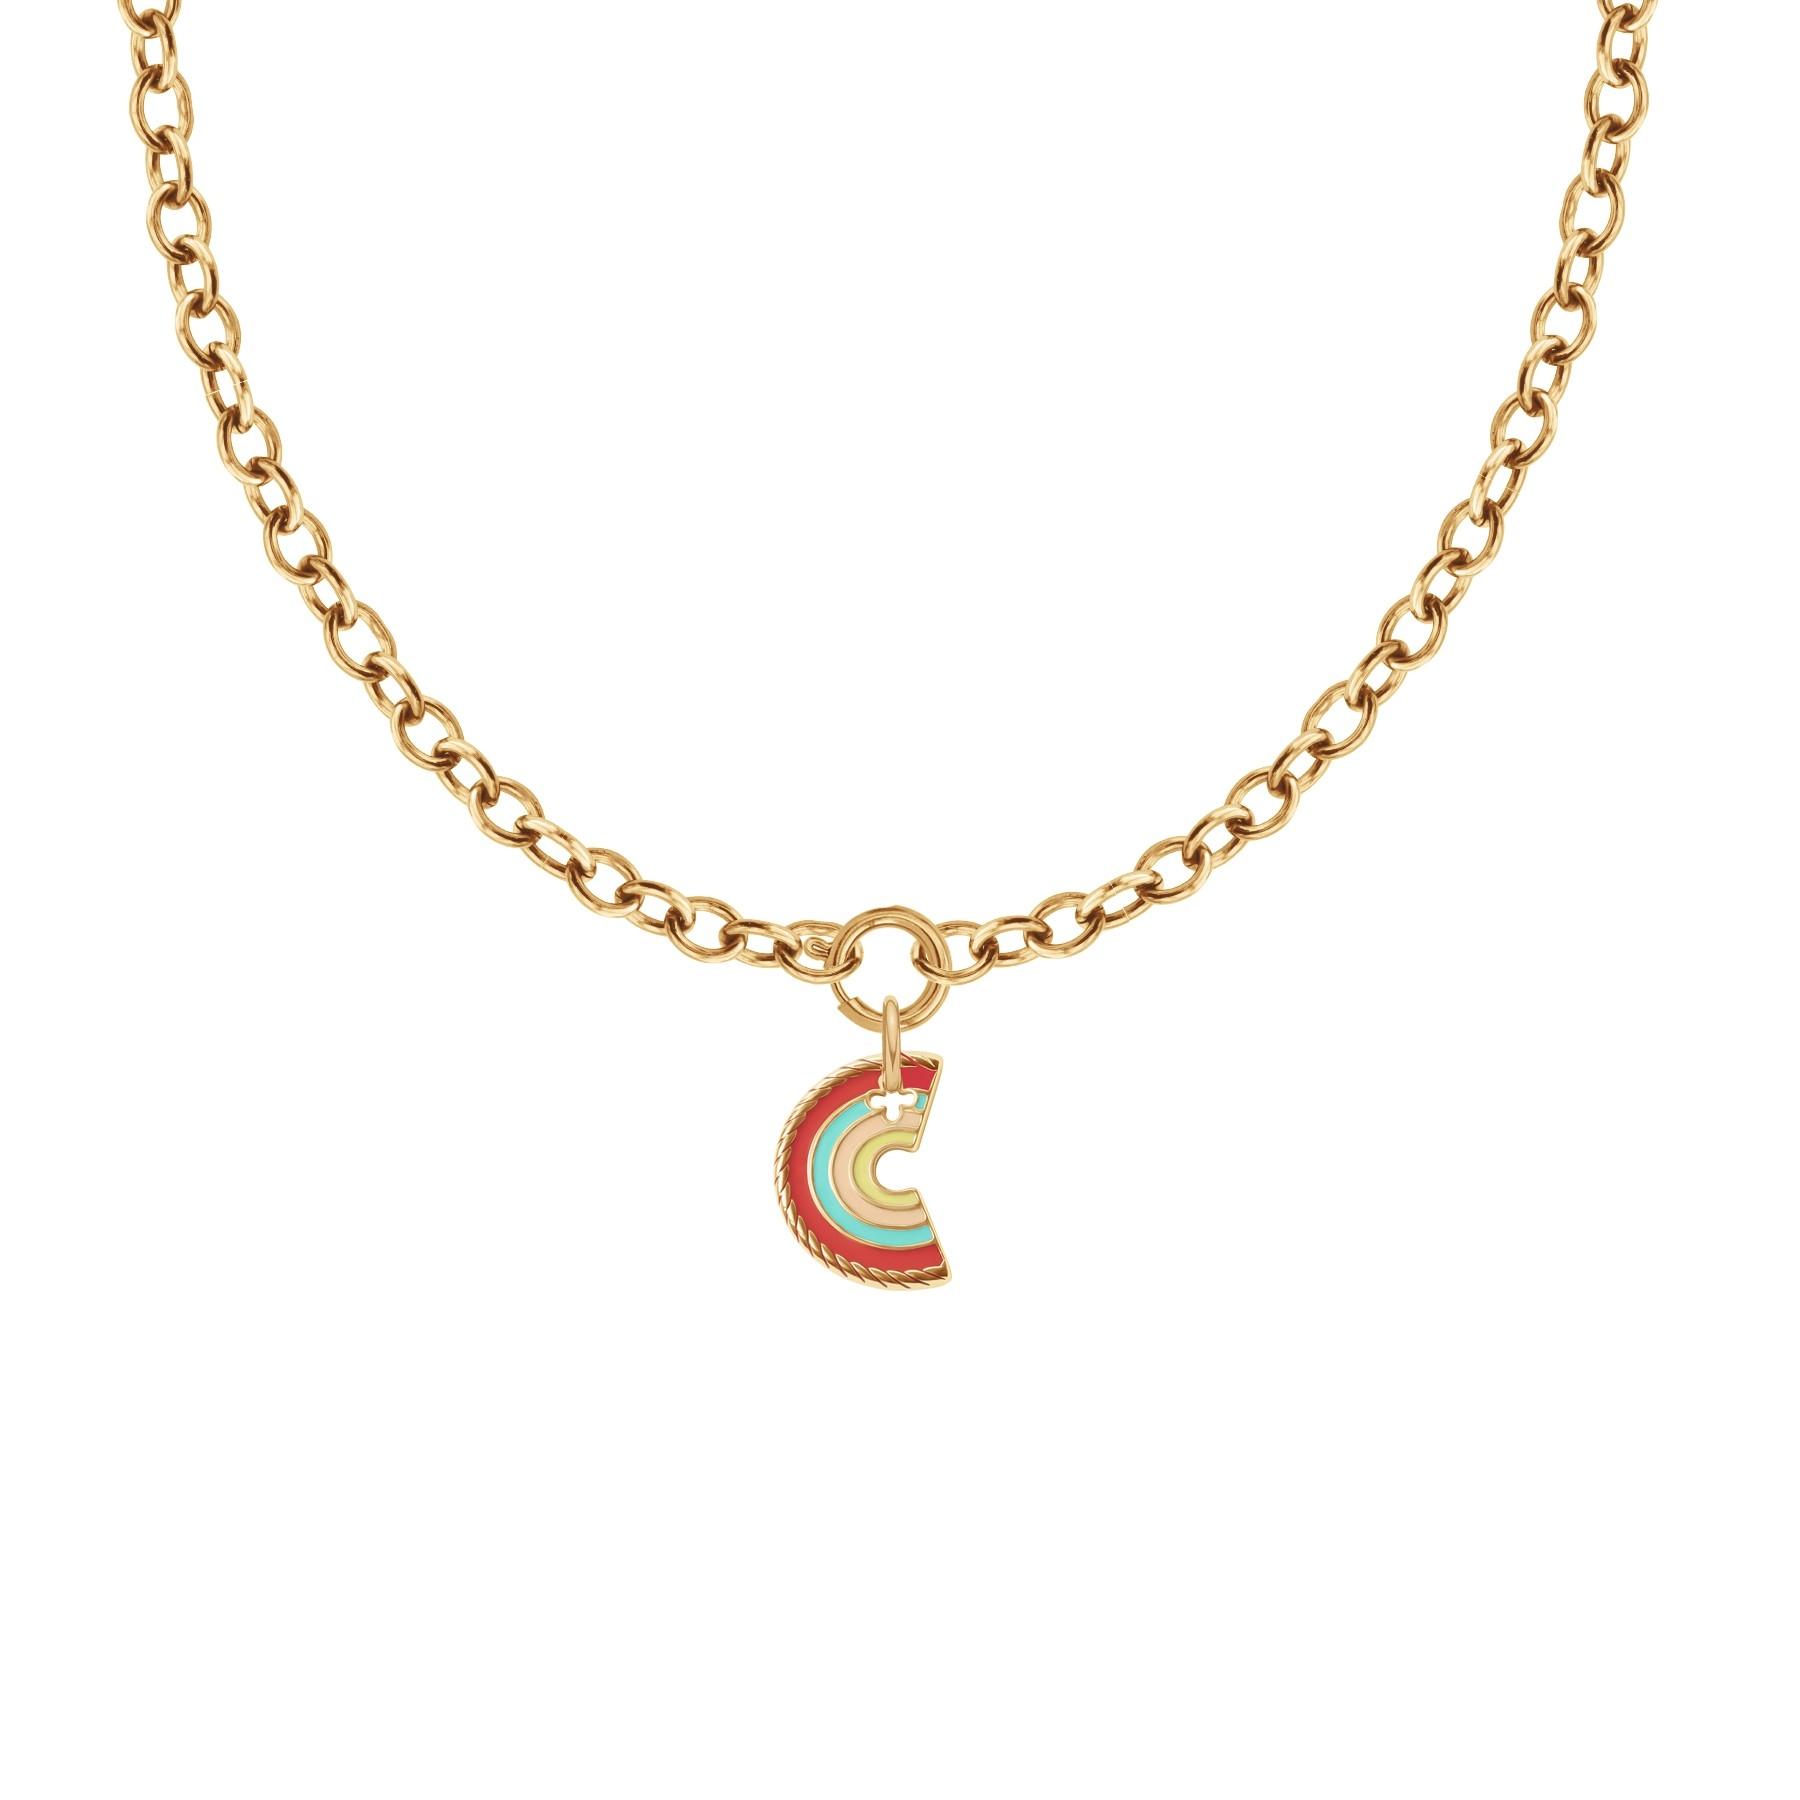 Collier Chaîne No.1 avec pendentif Rainbow, plaqué or